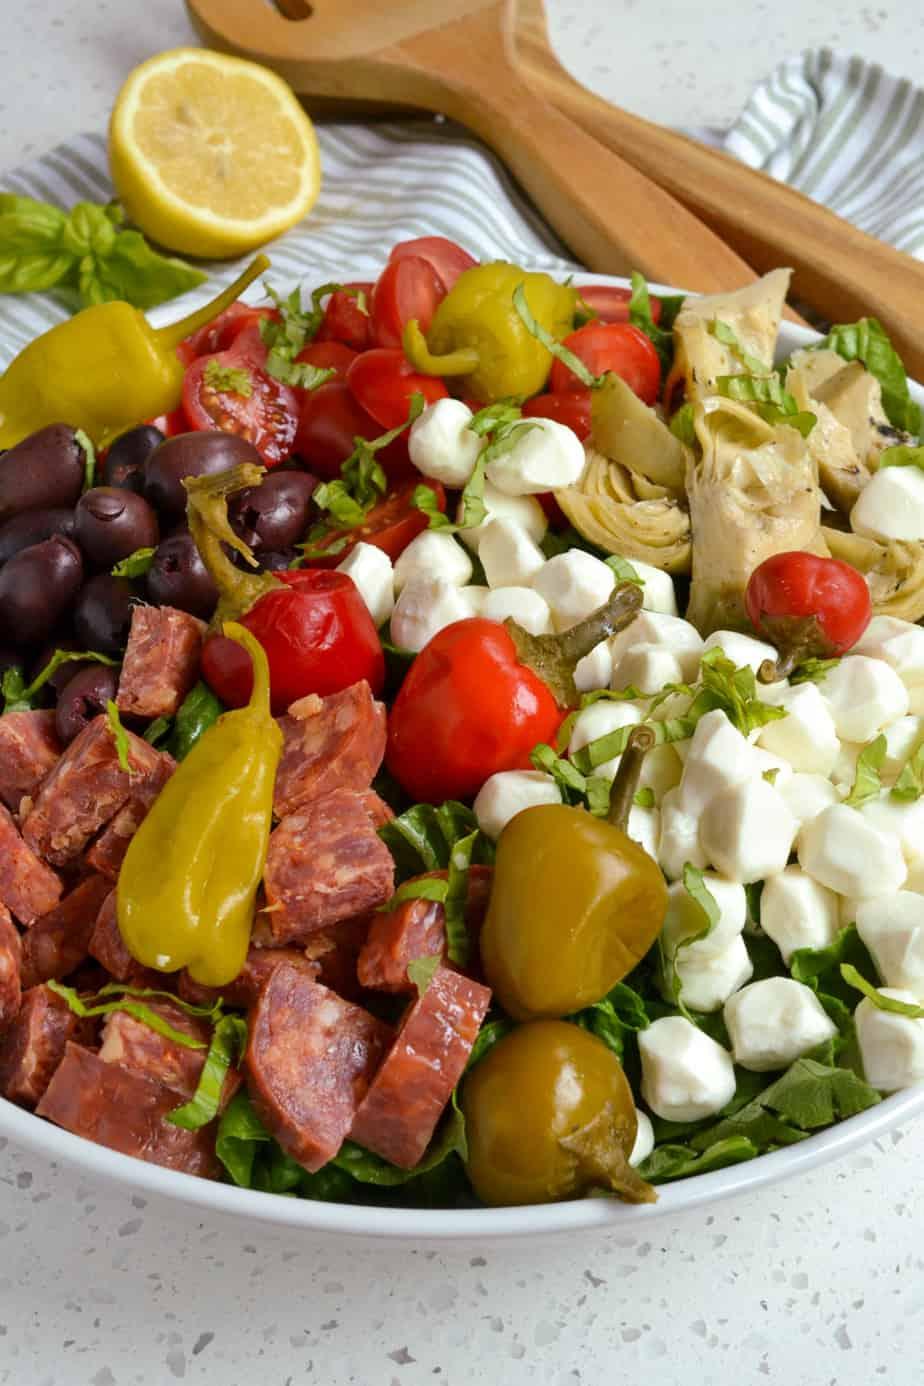 Italian salad with fresh mozzarella, salami, Kalamata olives, artichoke hearts, and peperoncini.